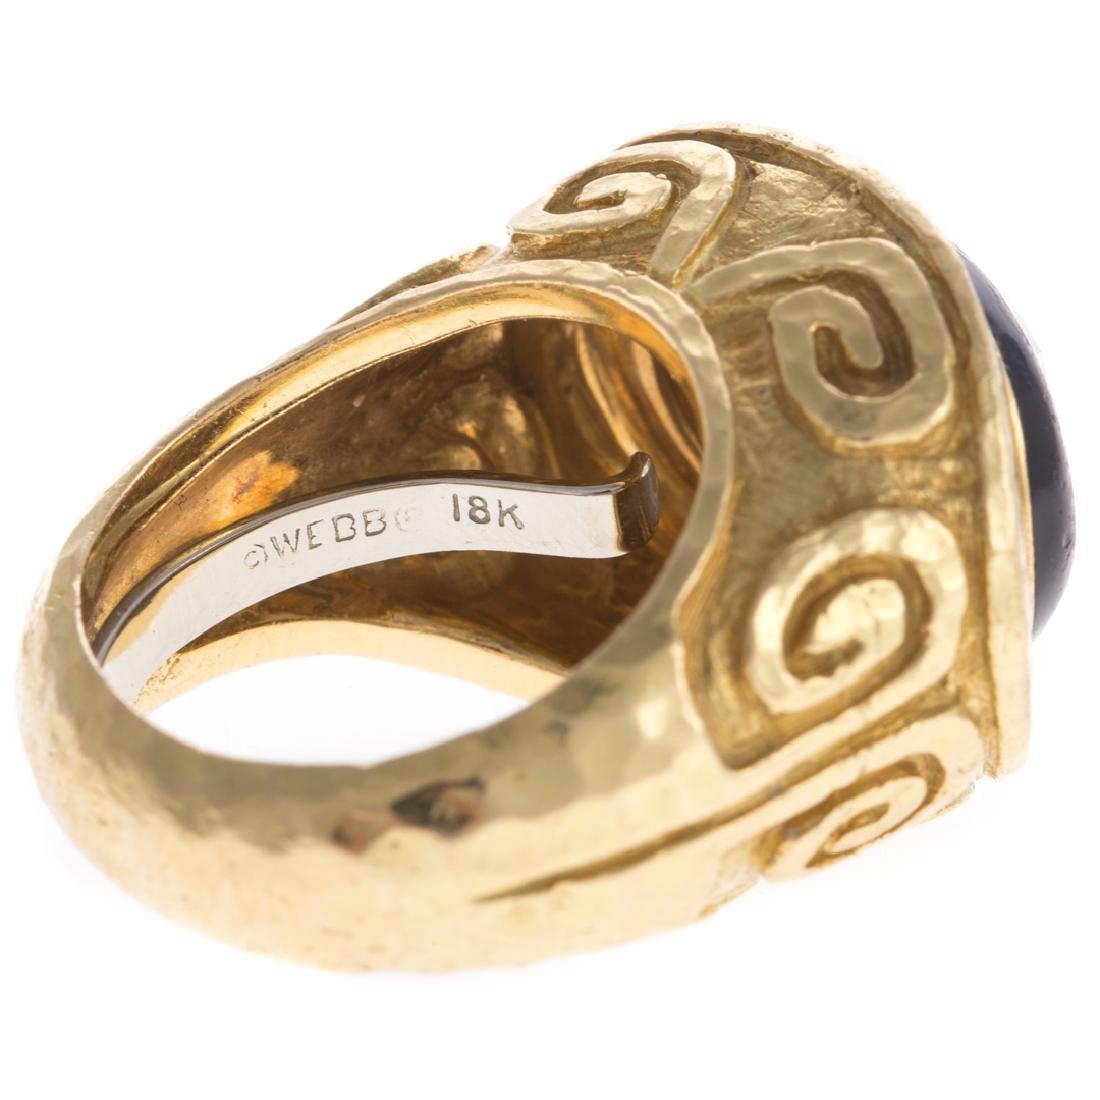 A 18K Diamond Ring & Enamel by David Webb - 7